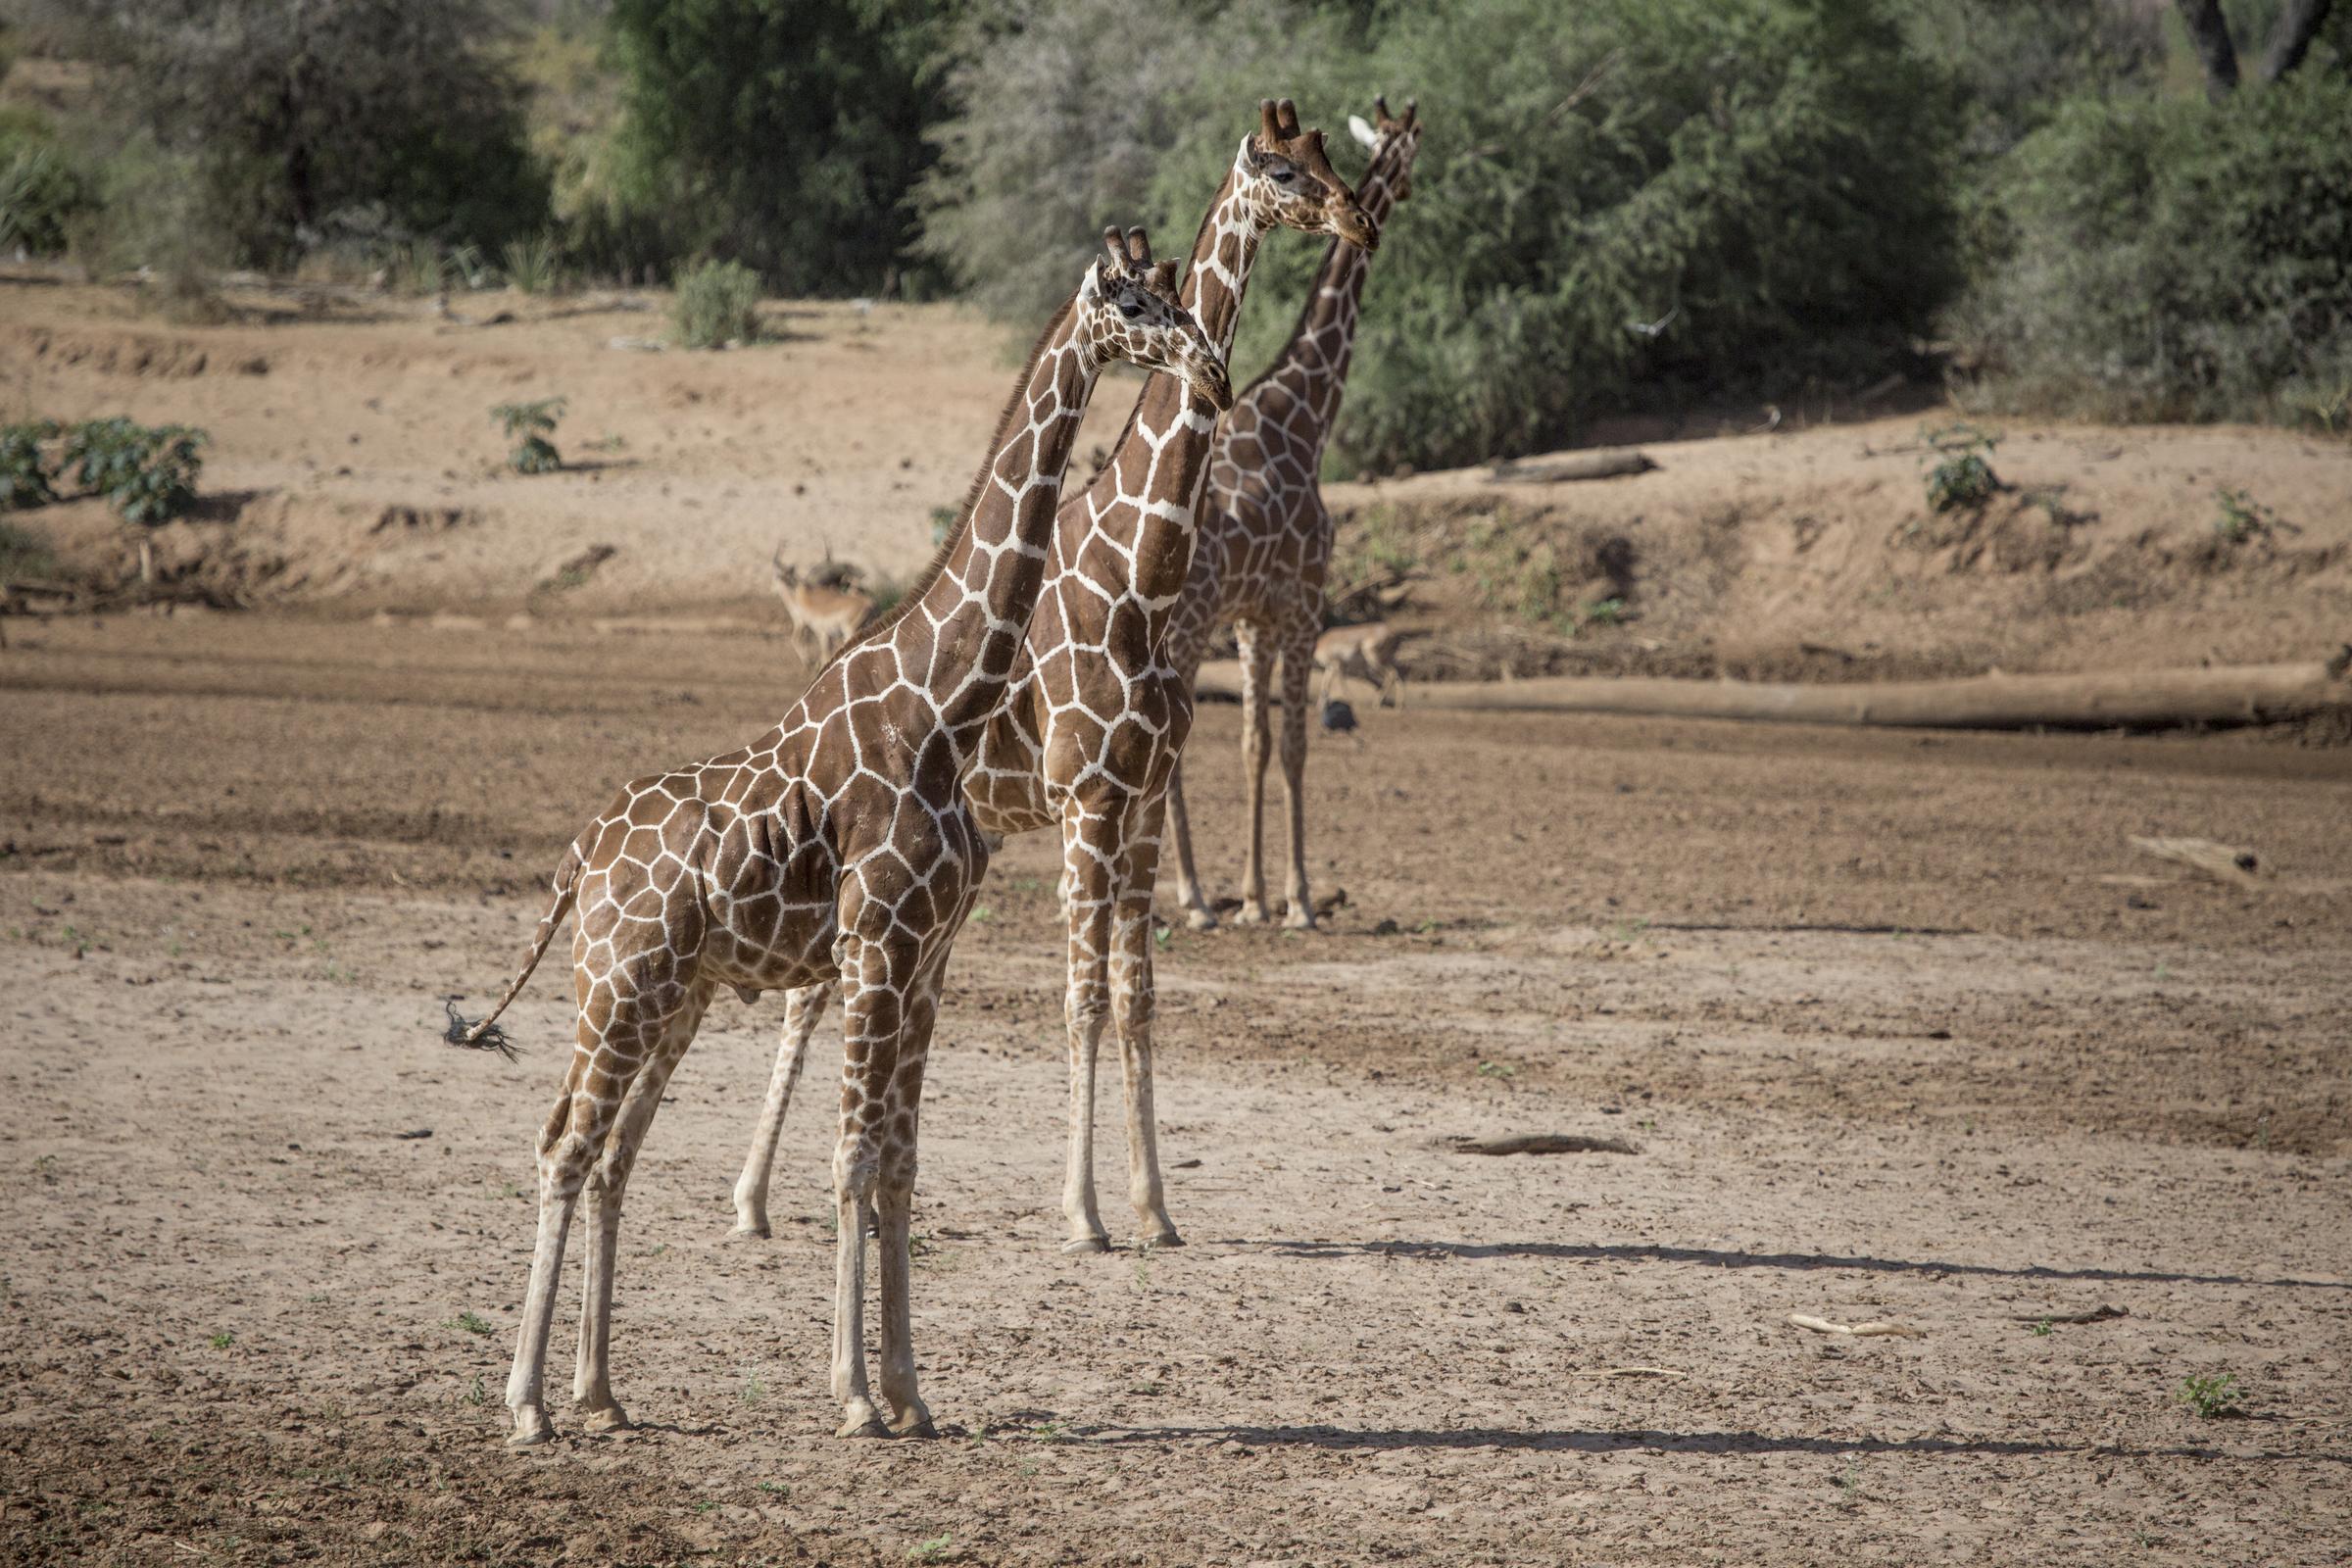 Magestic giraffe.jpg